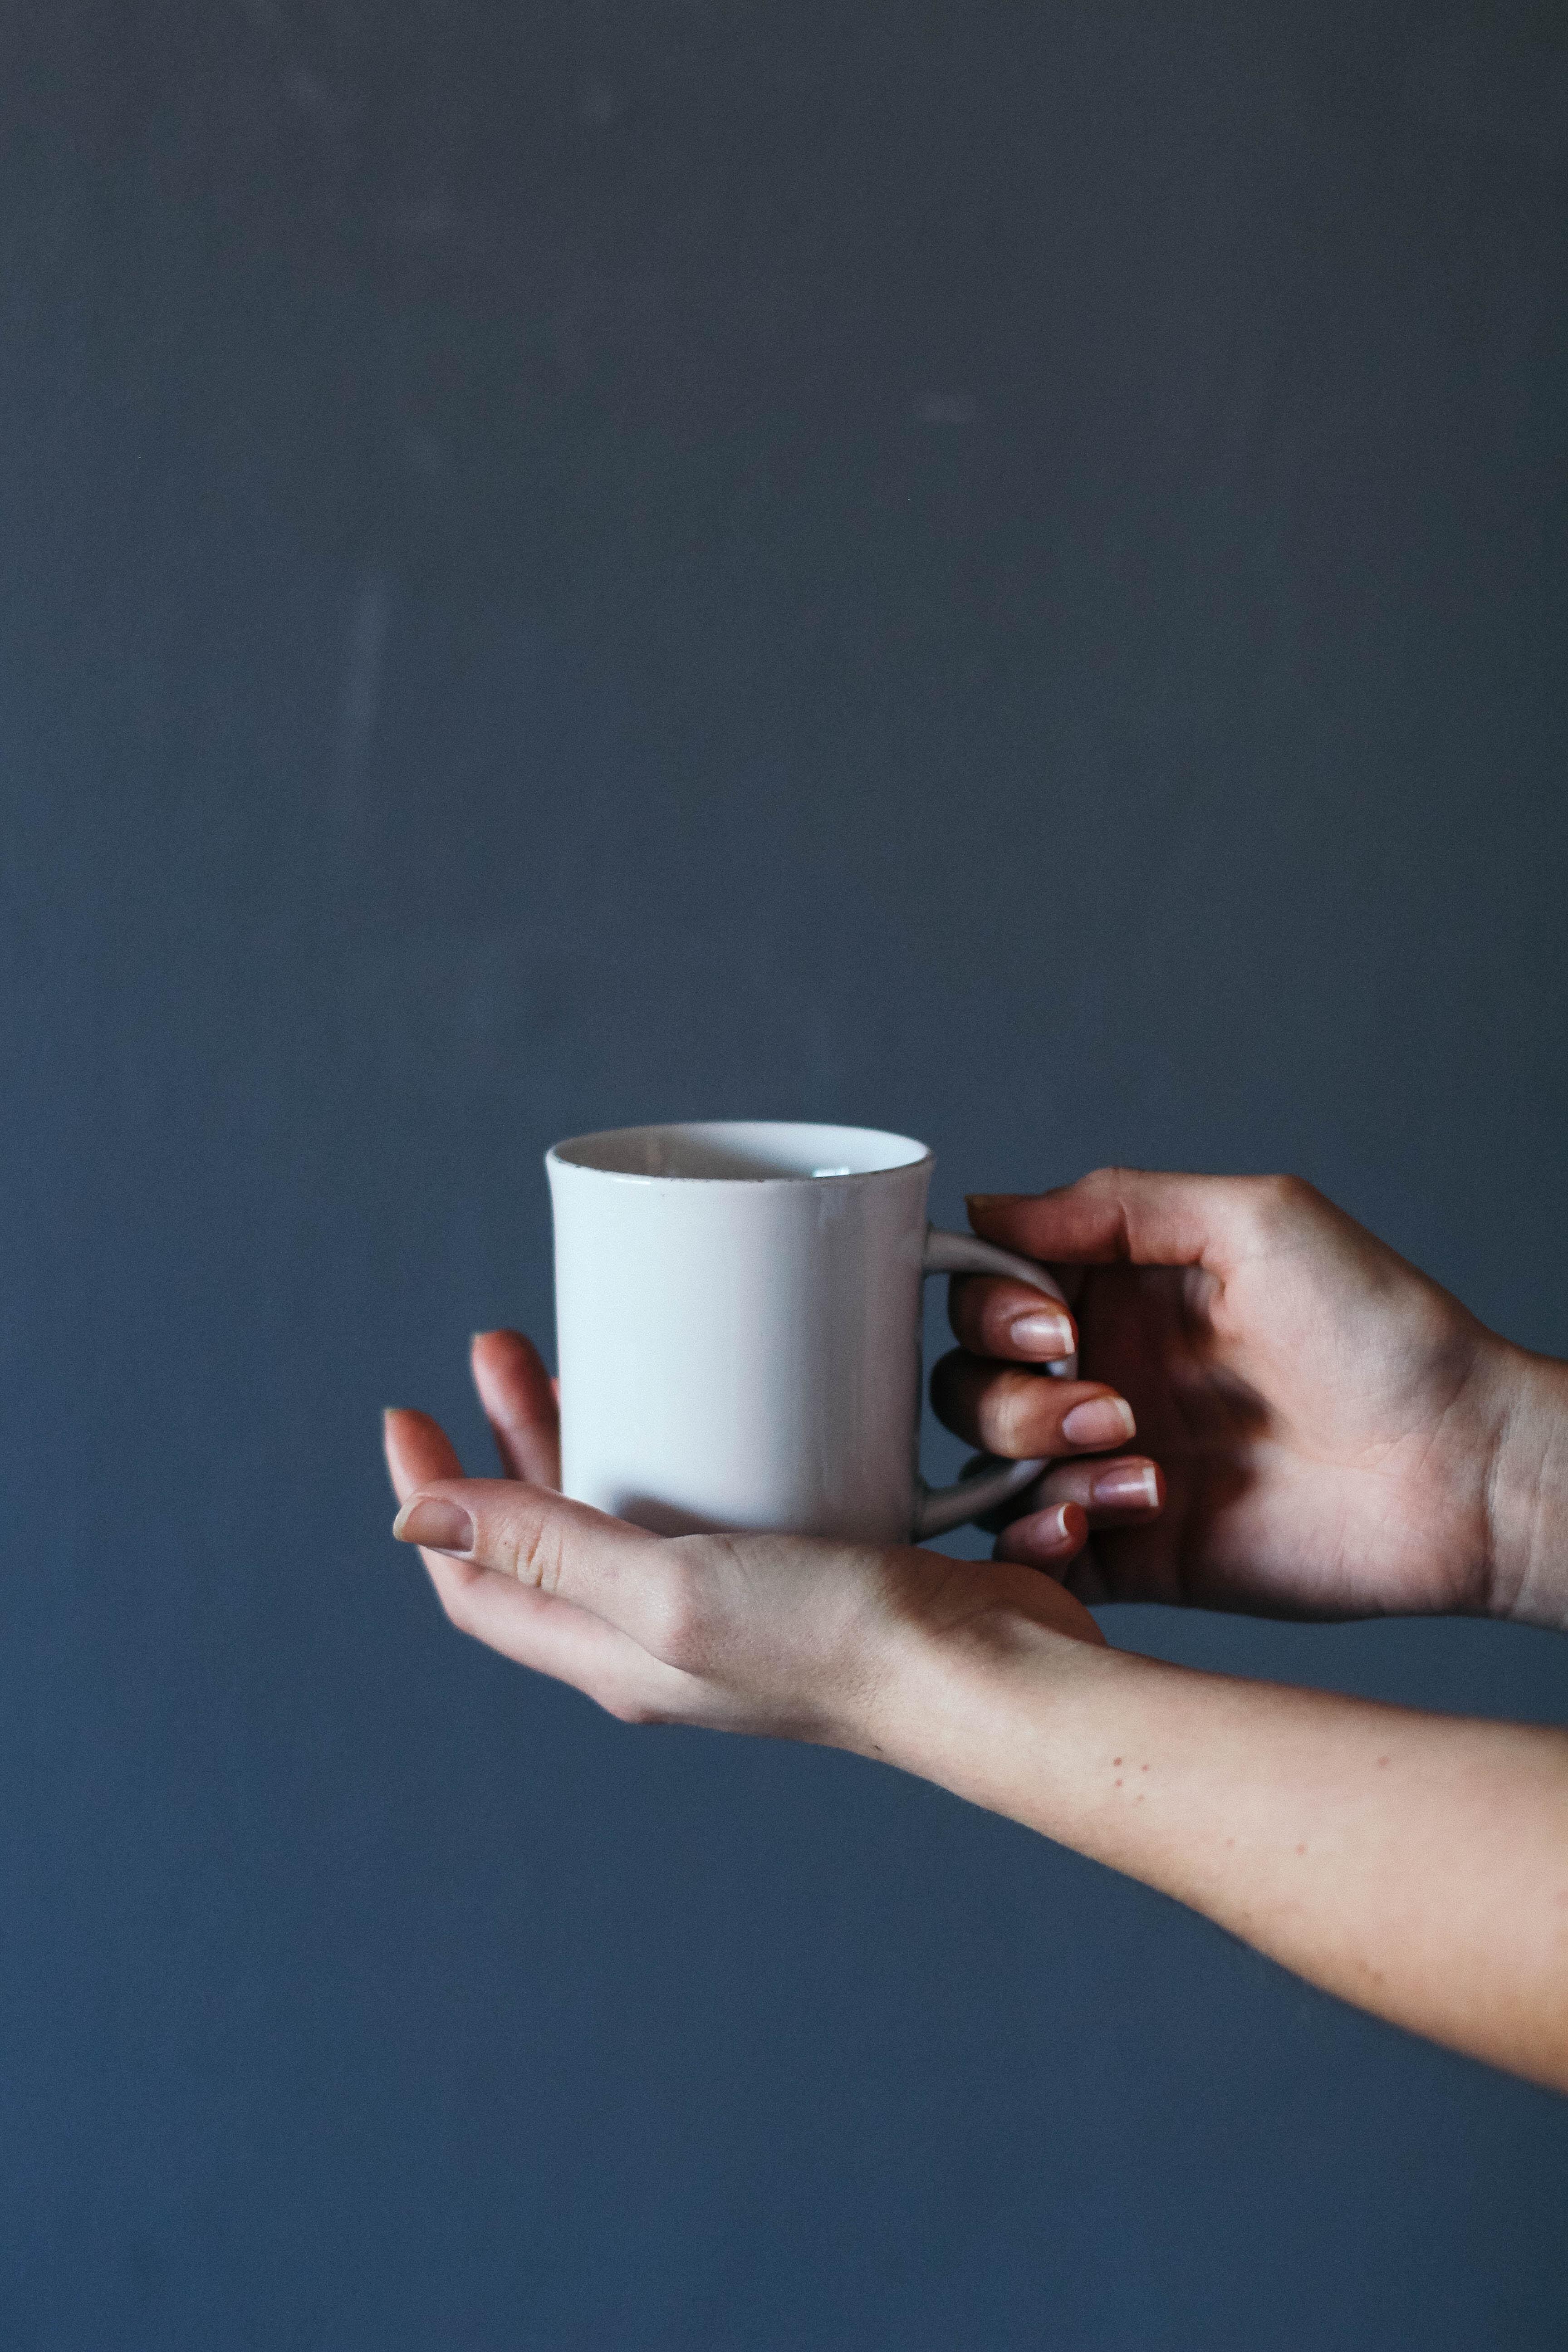 person holding grey ceramic mug